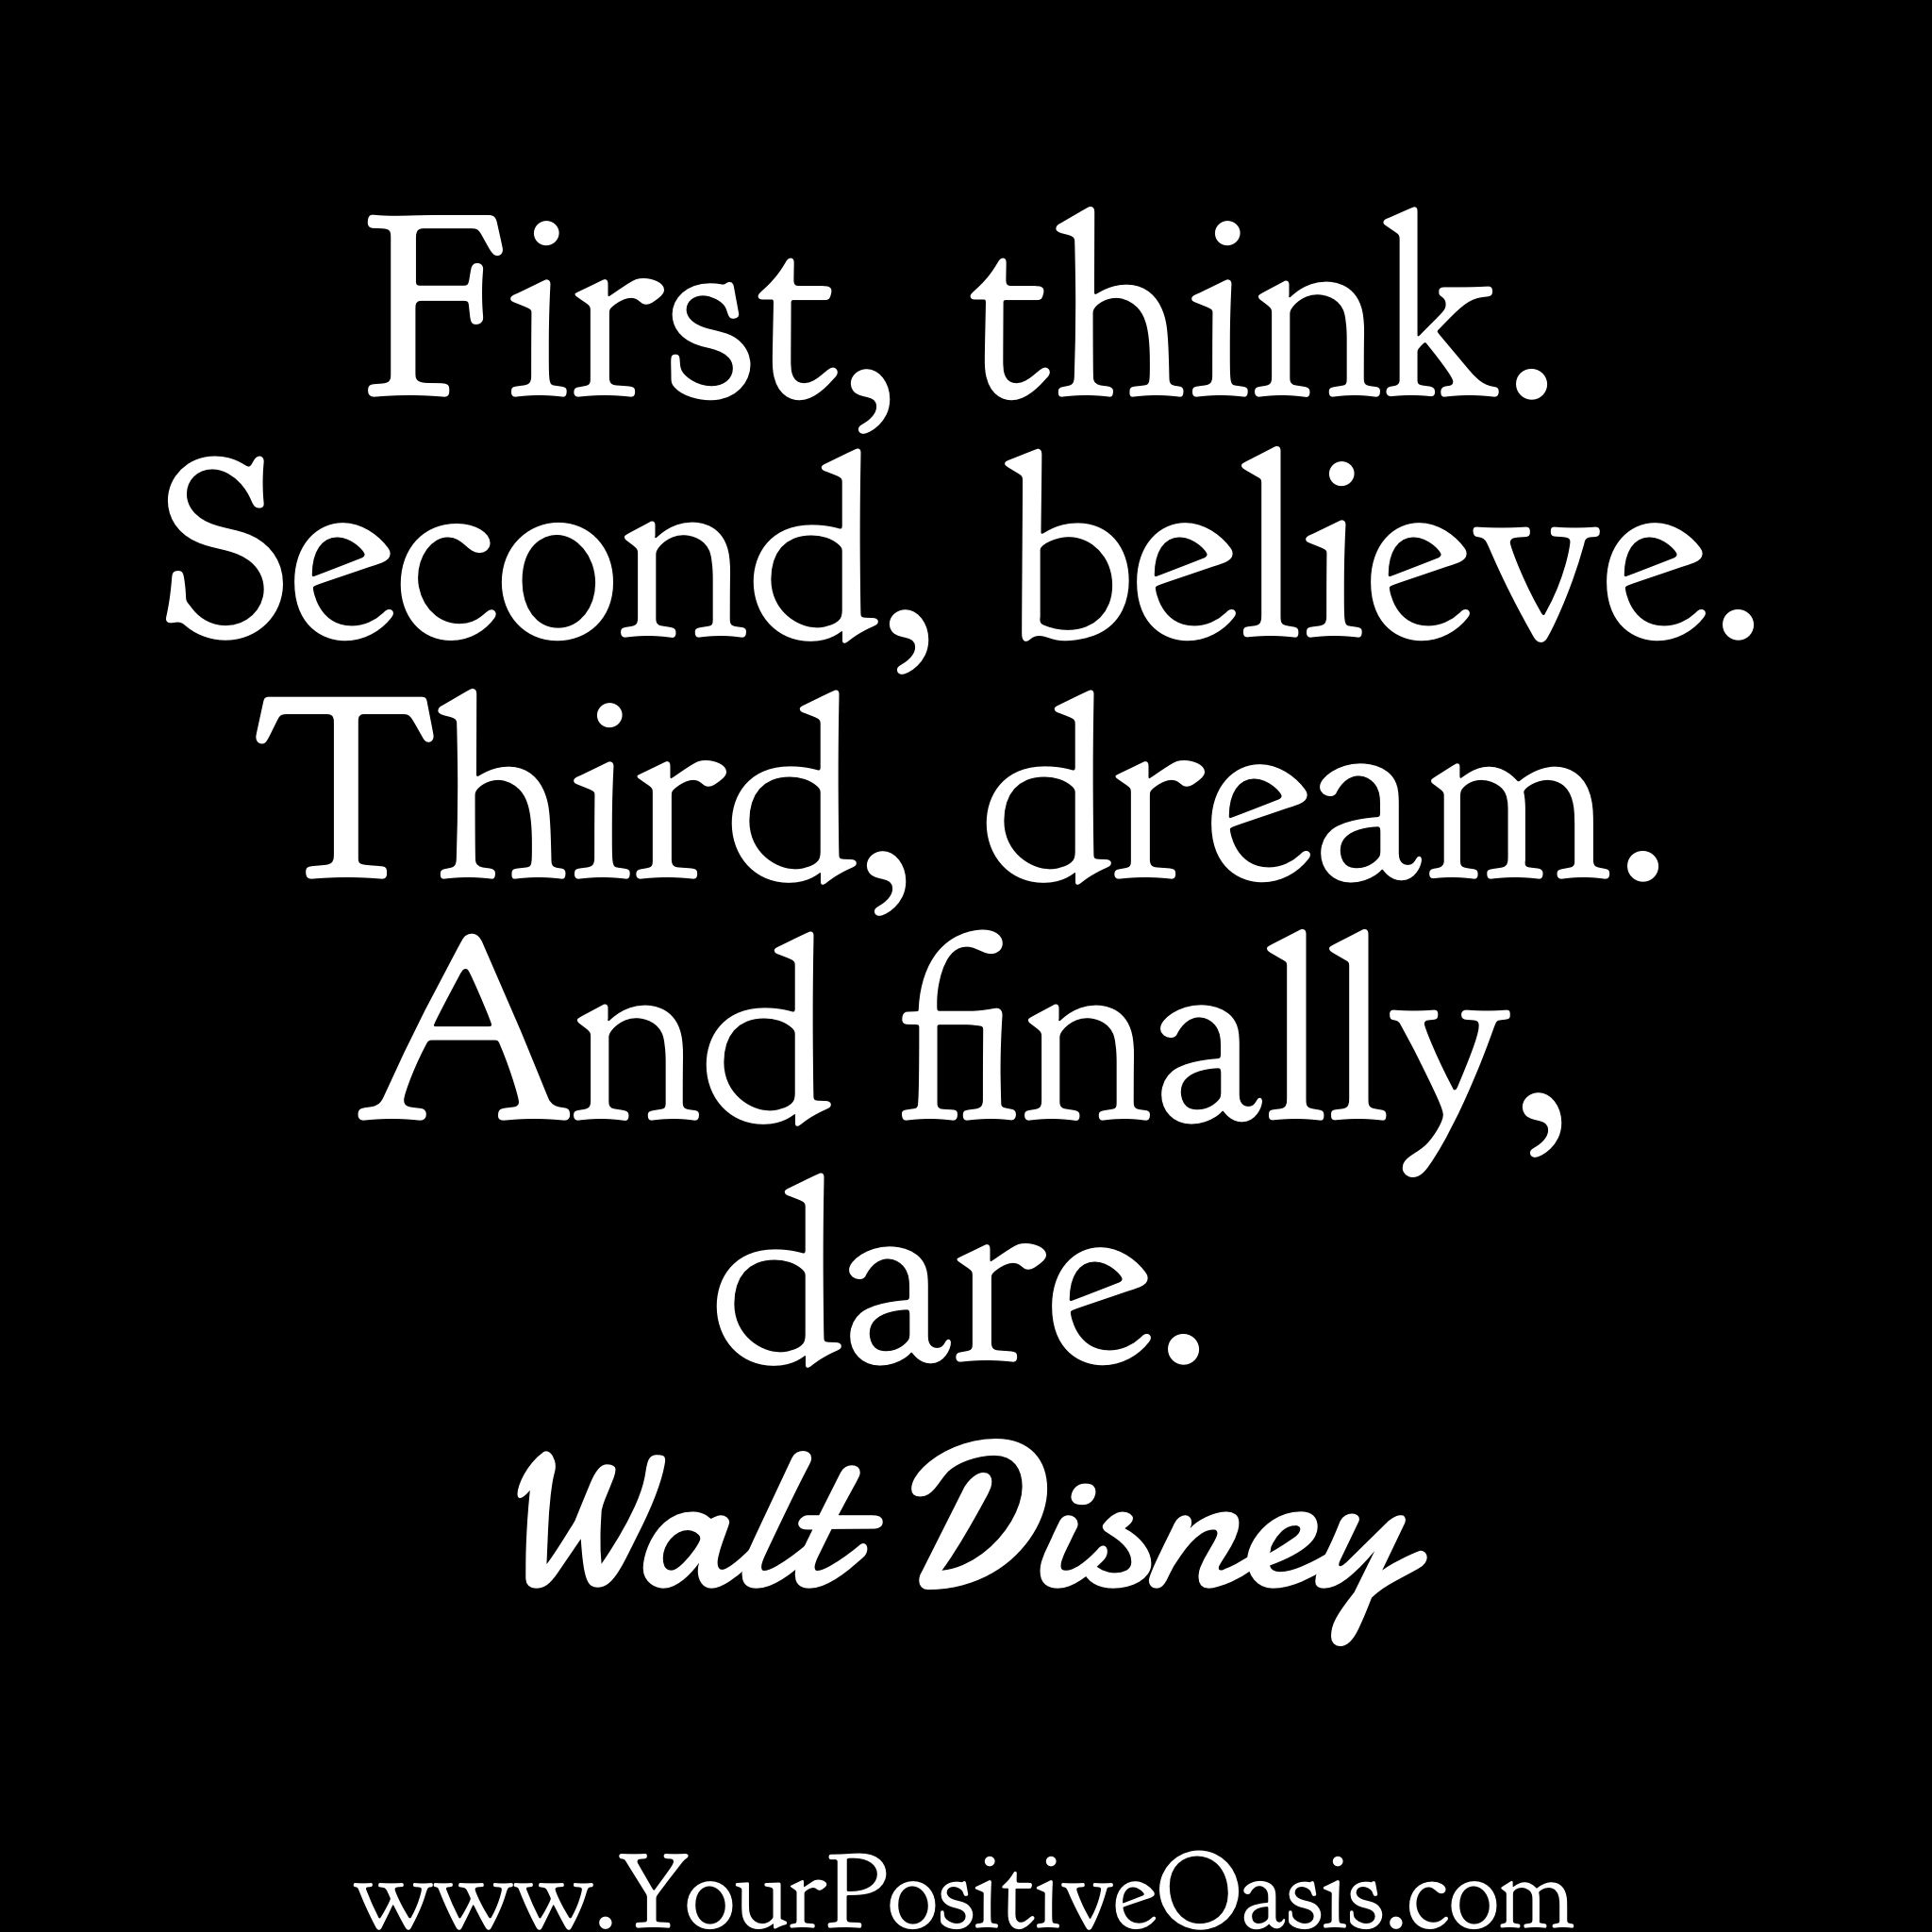 25 Walt Disney Quotes That Will Brighten Your Day | Hero ...